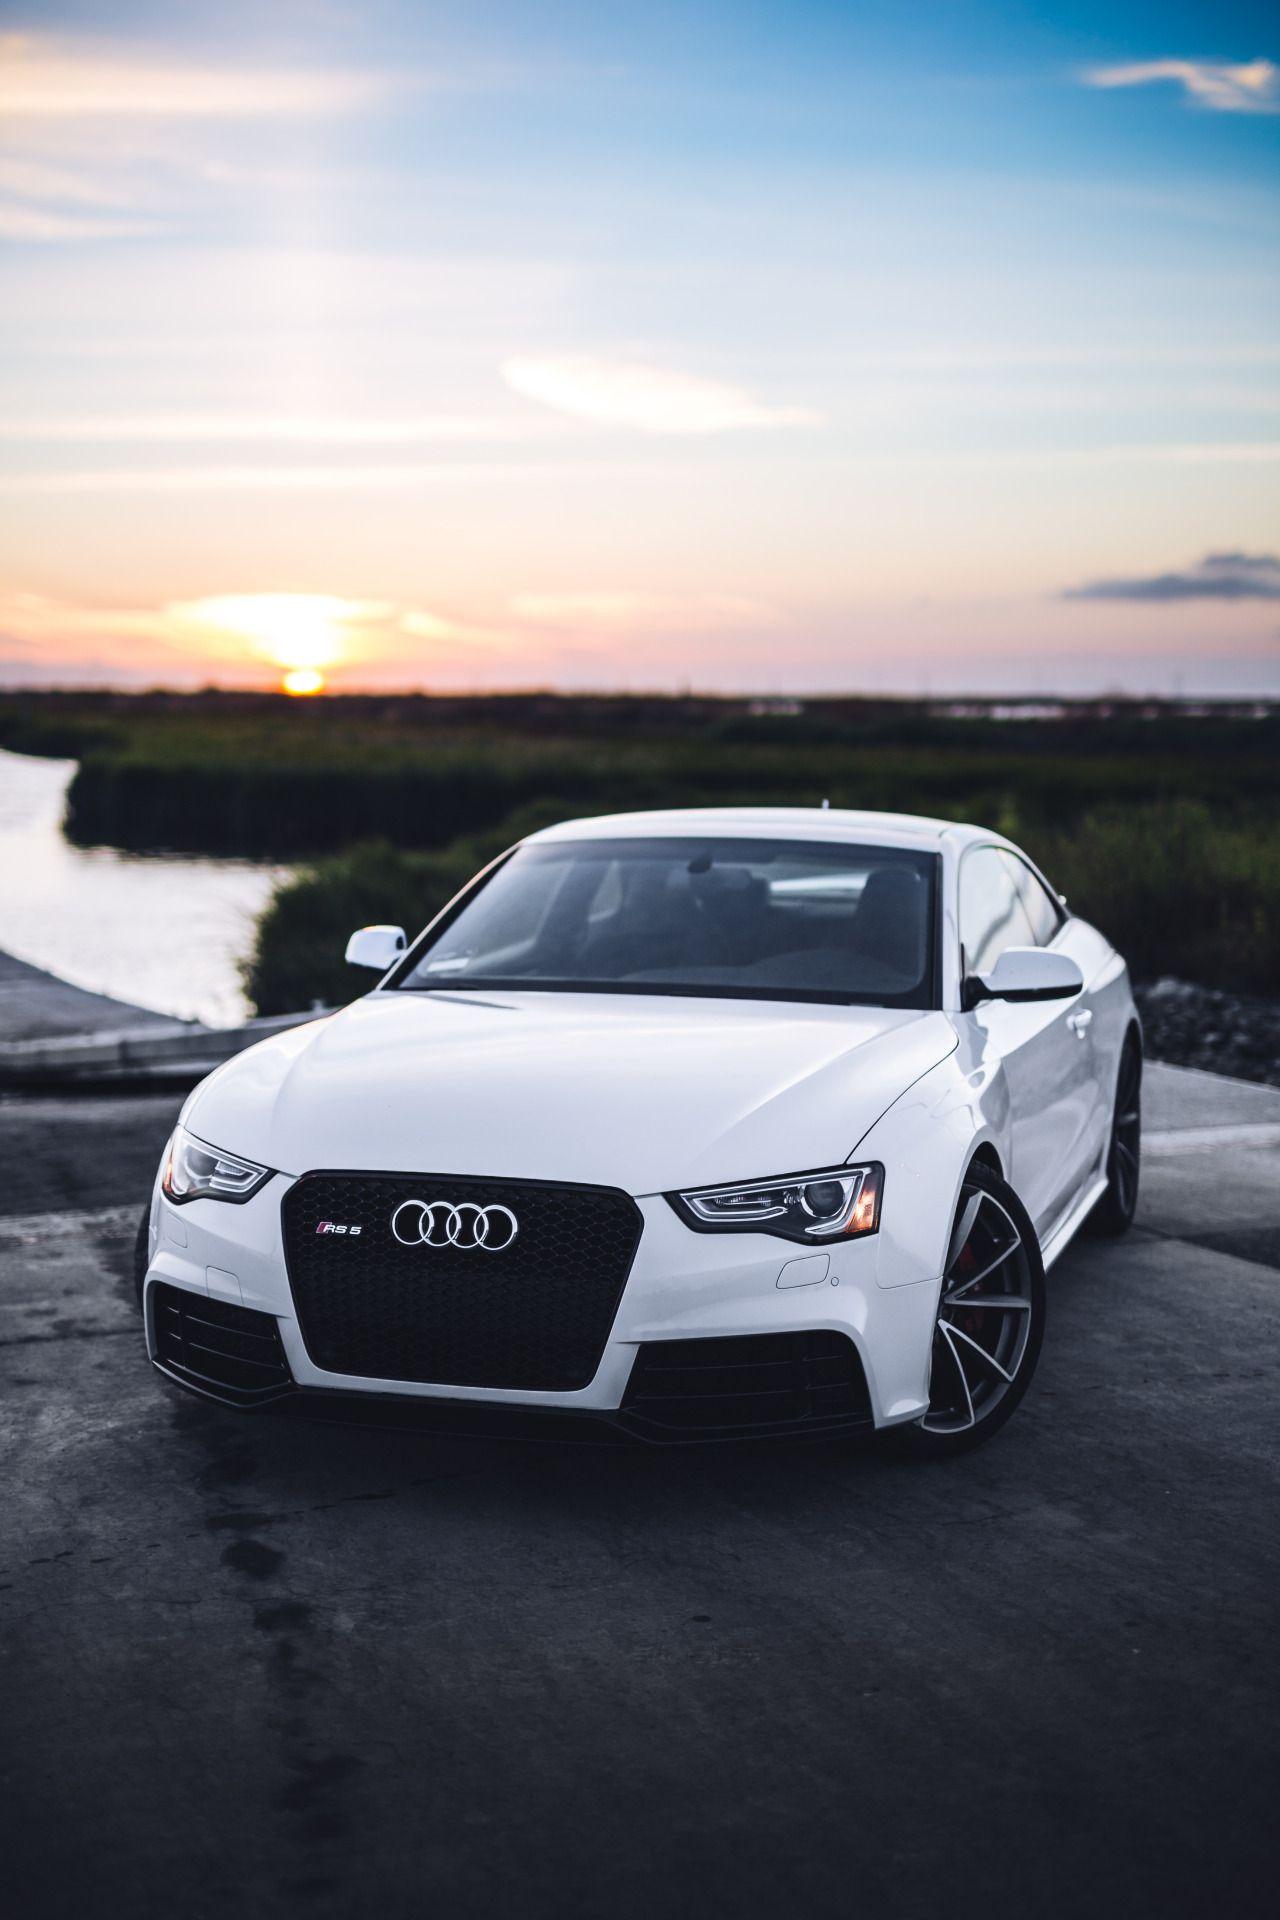 White Audi Rs5 Dream Cars Audi Cars Best Luxury Cars